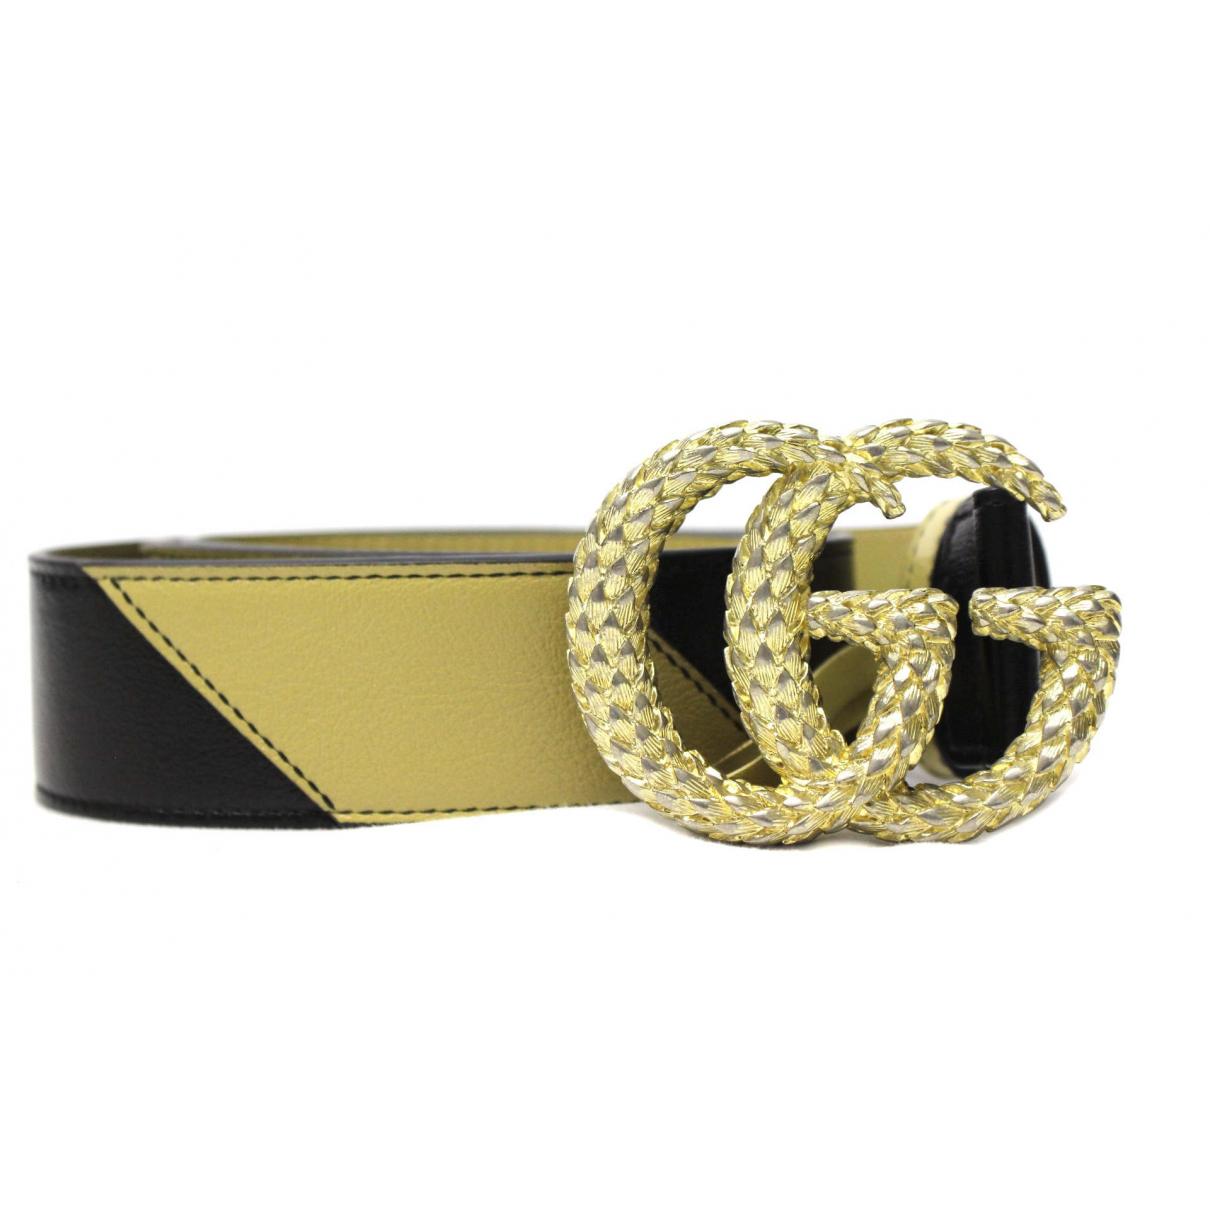 Gucci \N Beige Leather belt for Women 85 cm